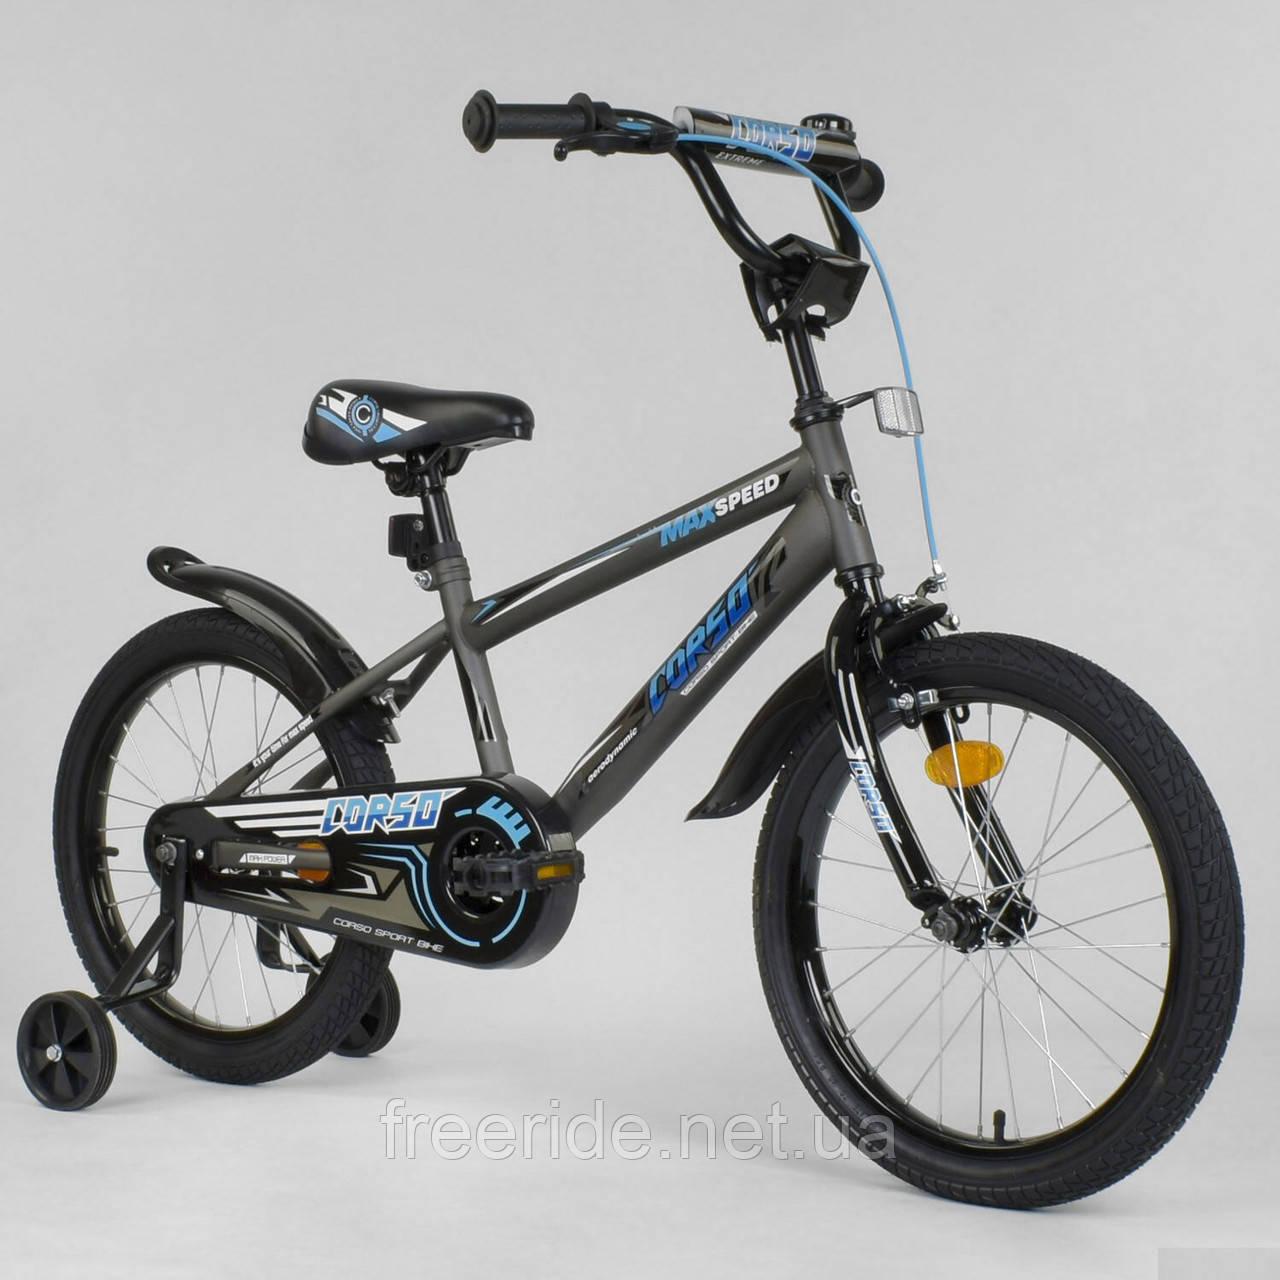 Детский Велосипед Aerodynamic CORSO EX-18 N